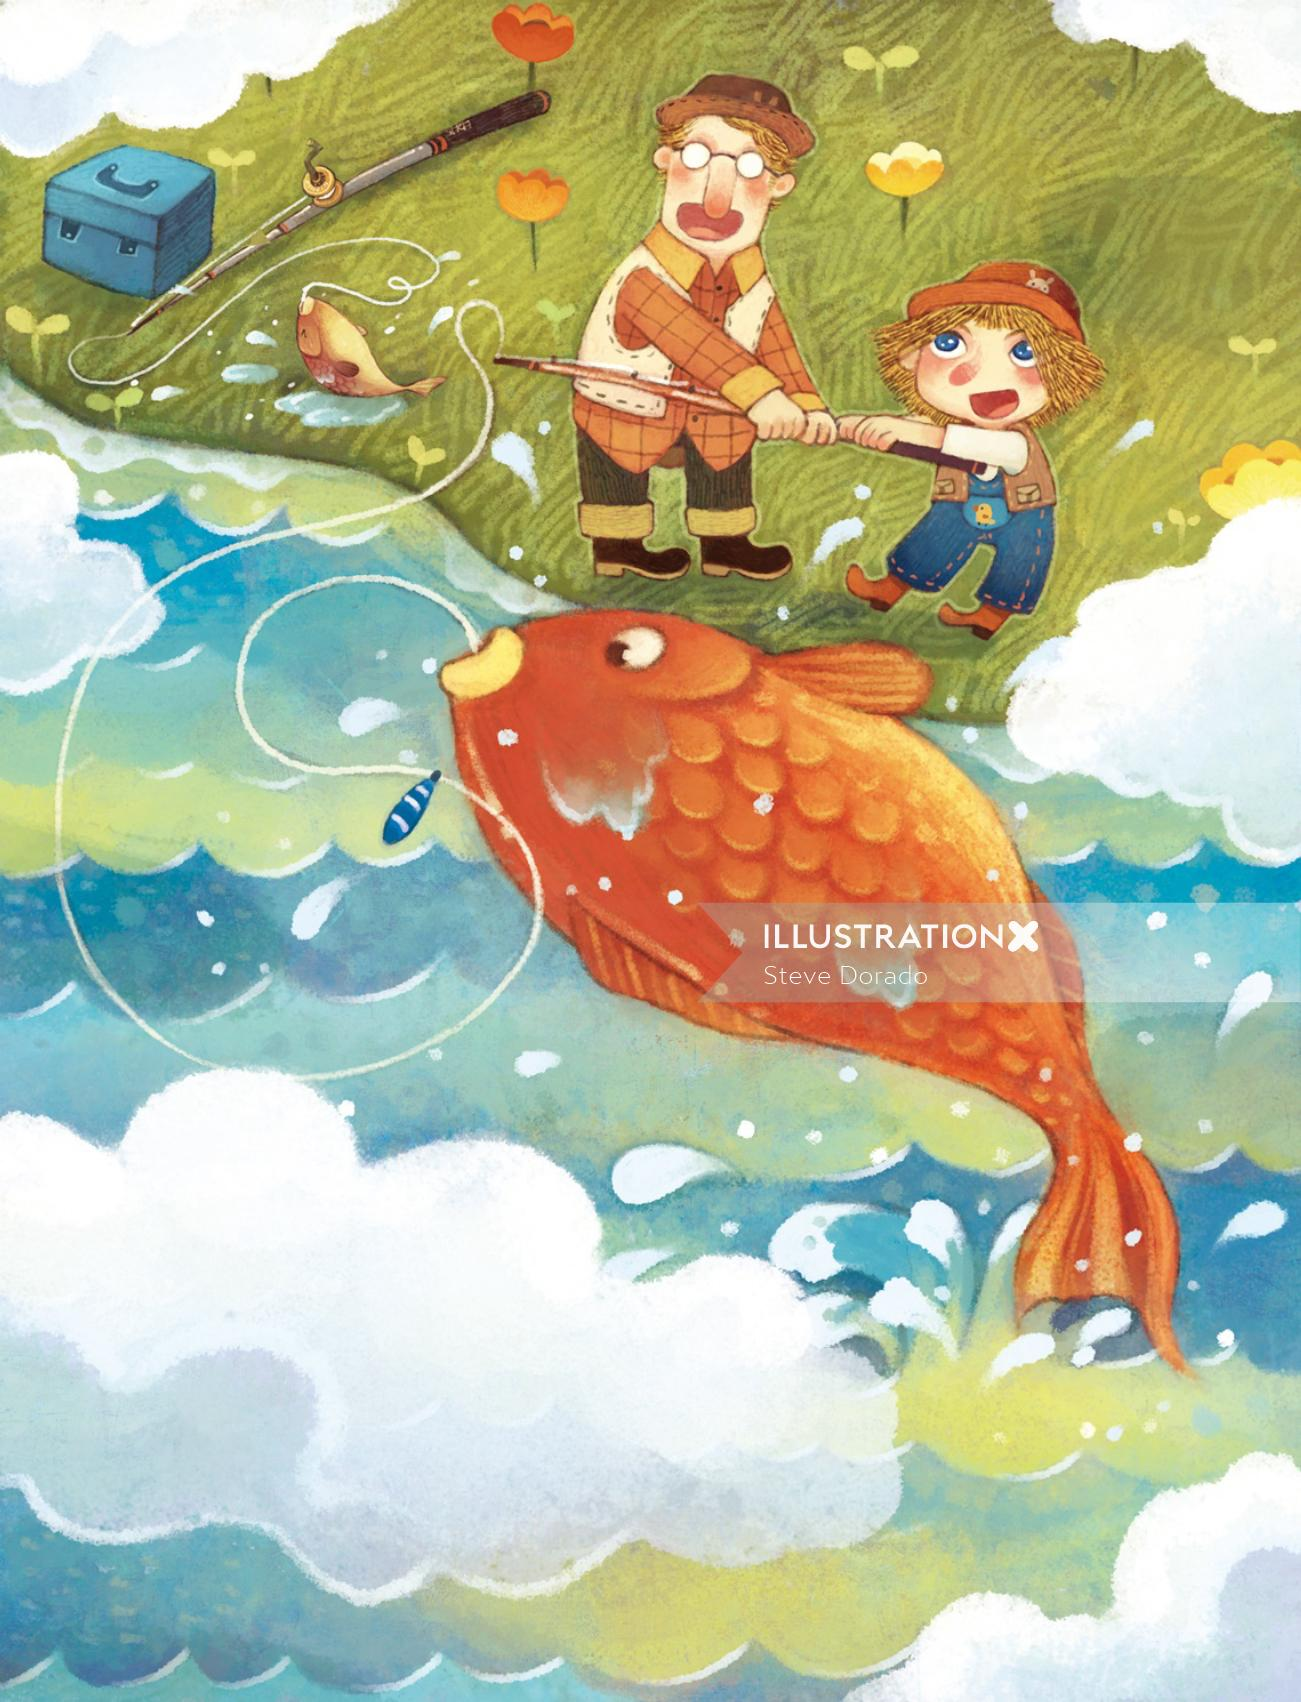 Children Illustration catching big fish